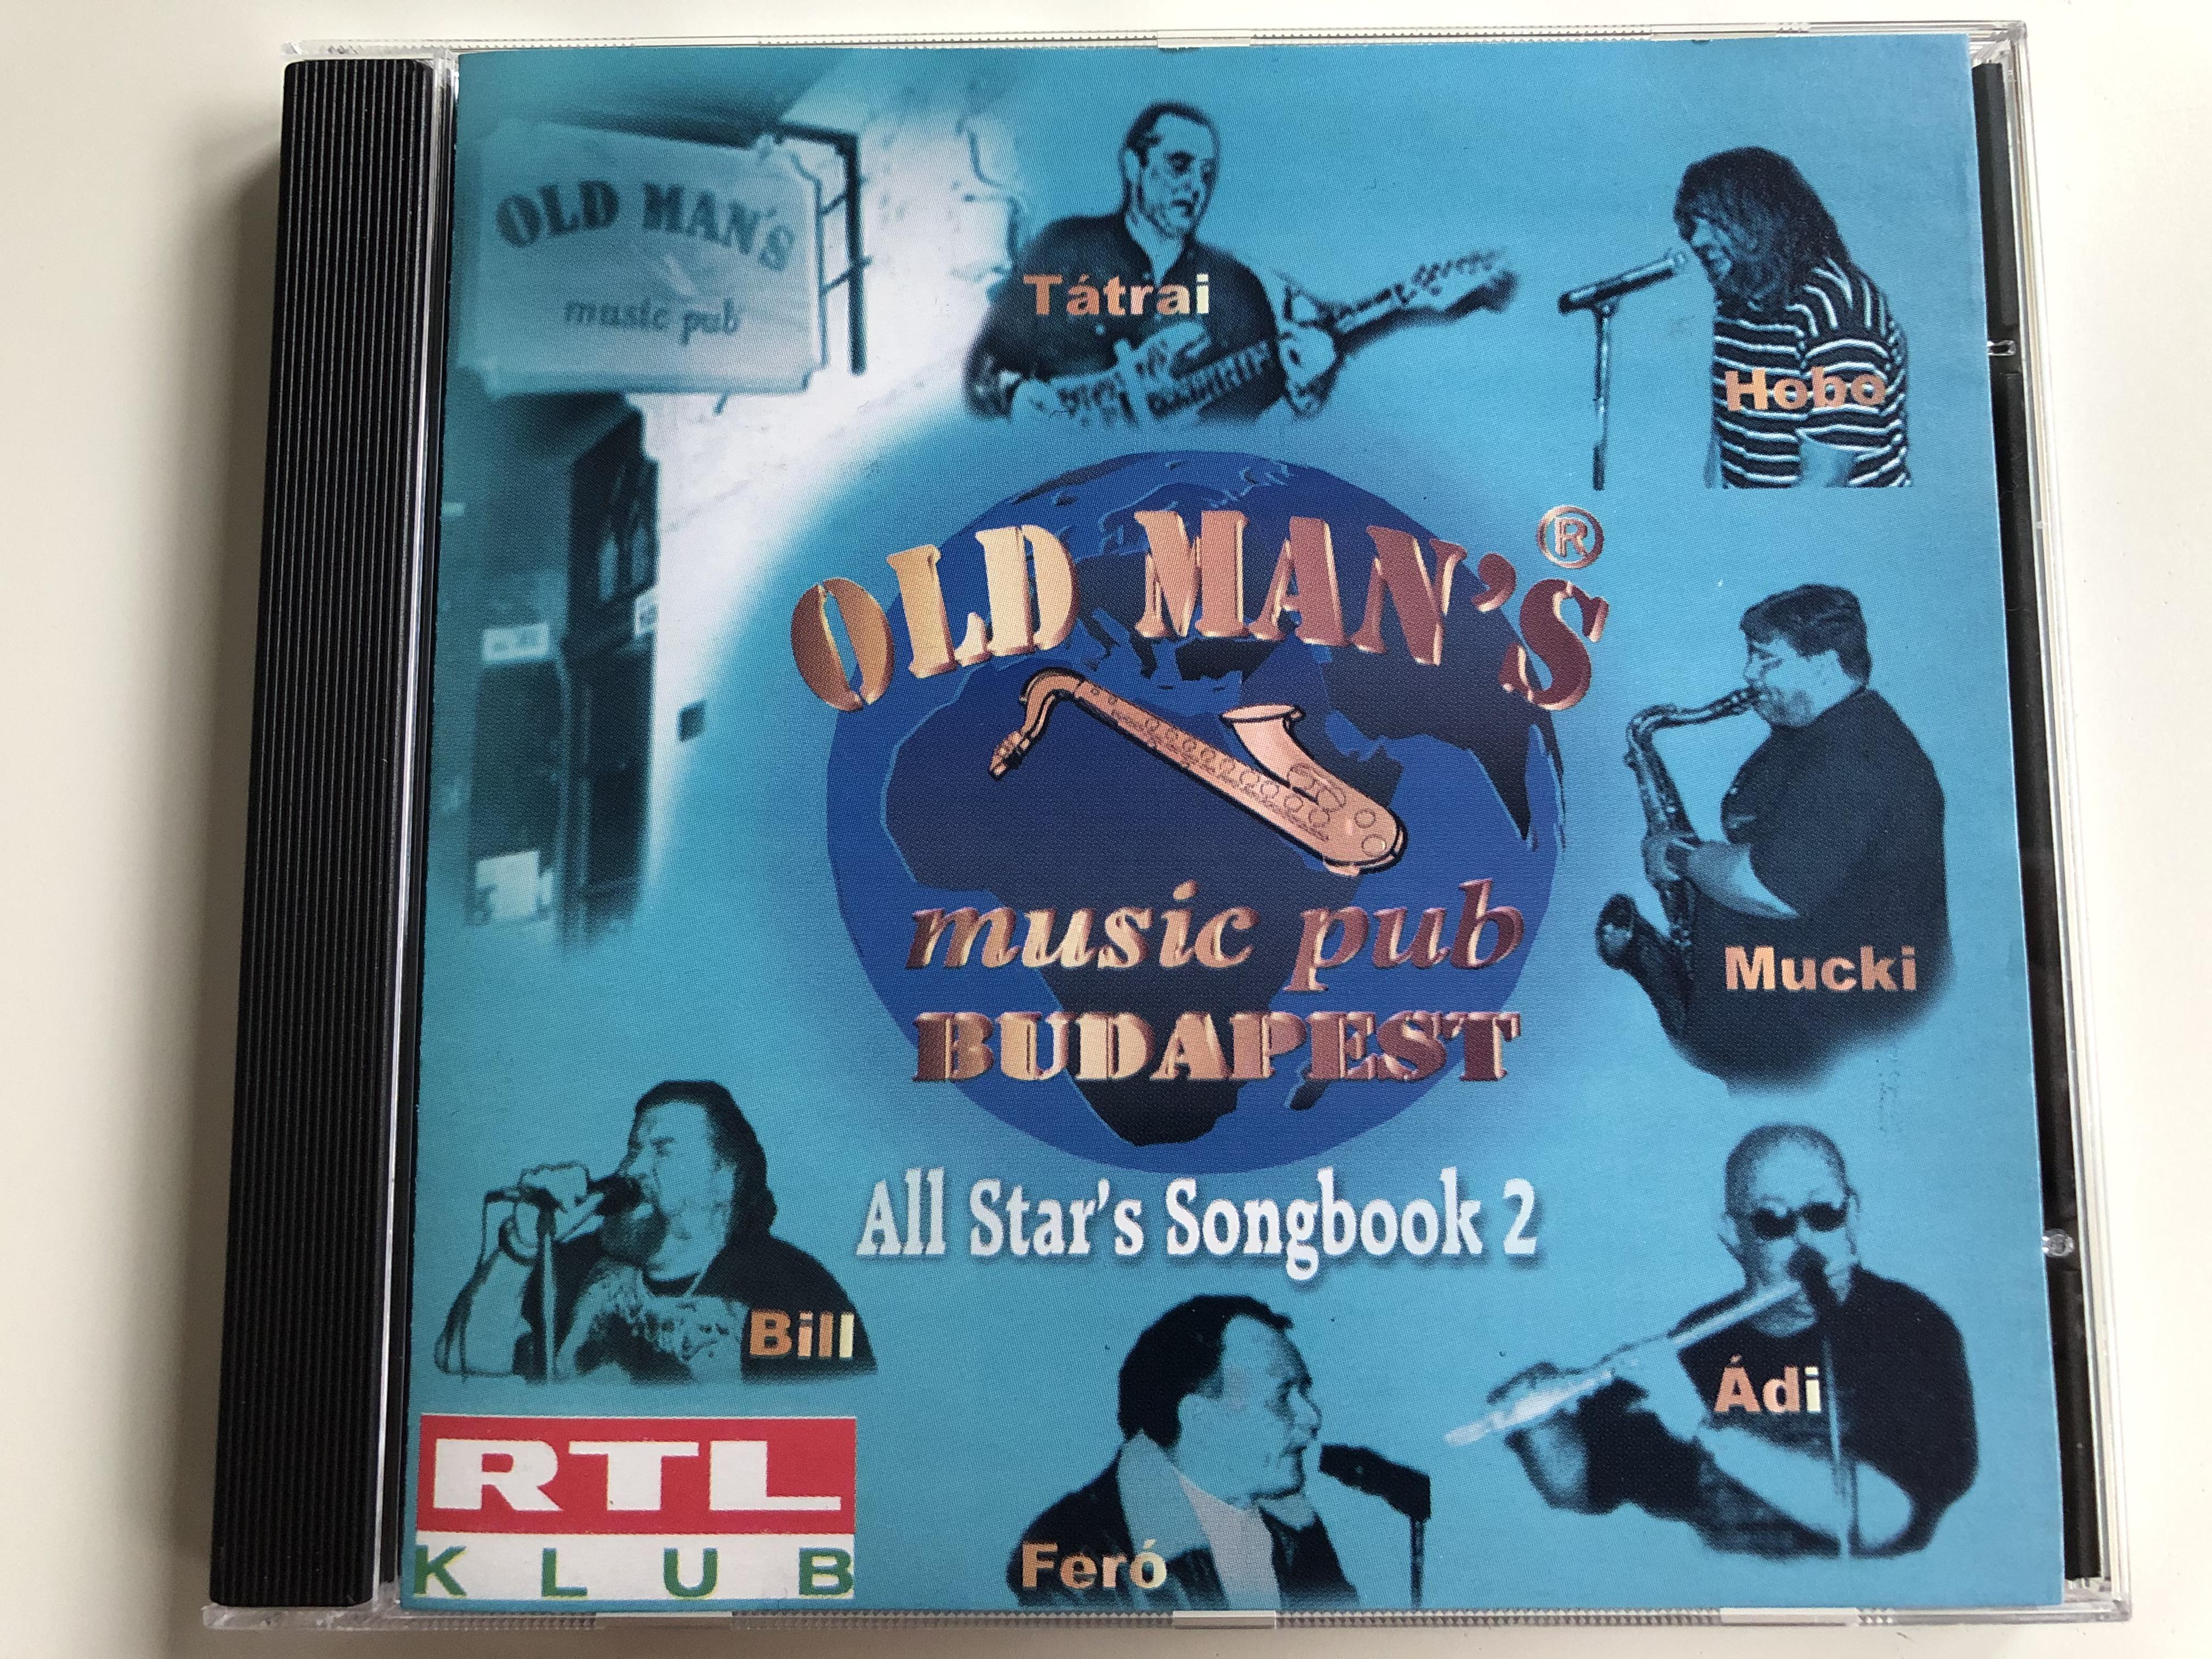 old-man-s-music-pub-budapest-all-star-s-songbook-2-tatrai-hebo-mucki-adi-fero-bill-old-man-s-records-audio-cd-2001-om-012-1-.jpg